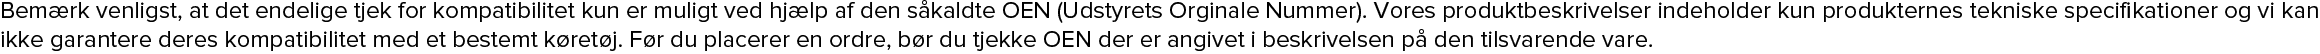 DENSO I88, 98059-5991U, 98059-599-2U Tændrør